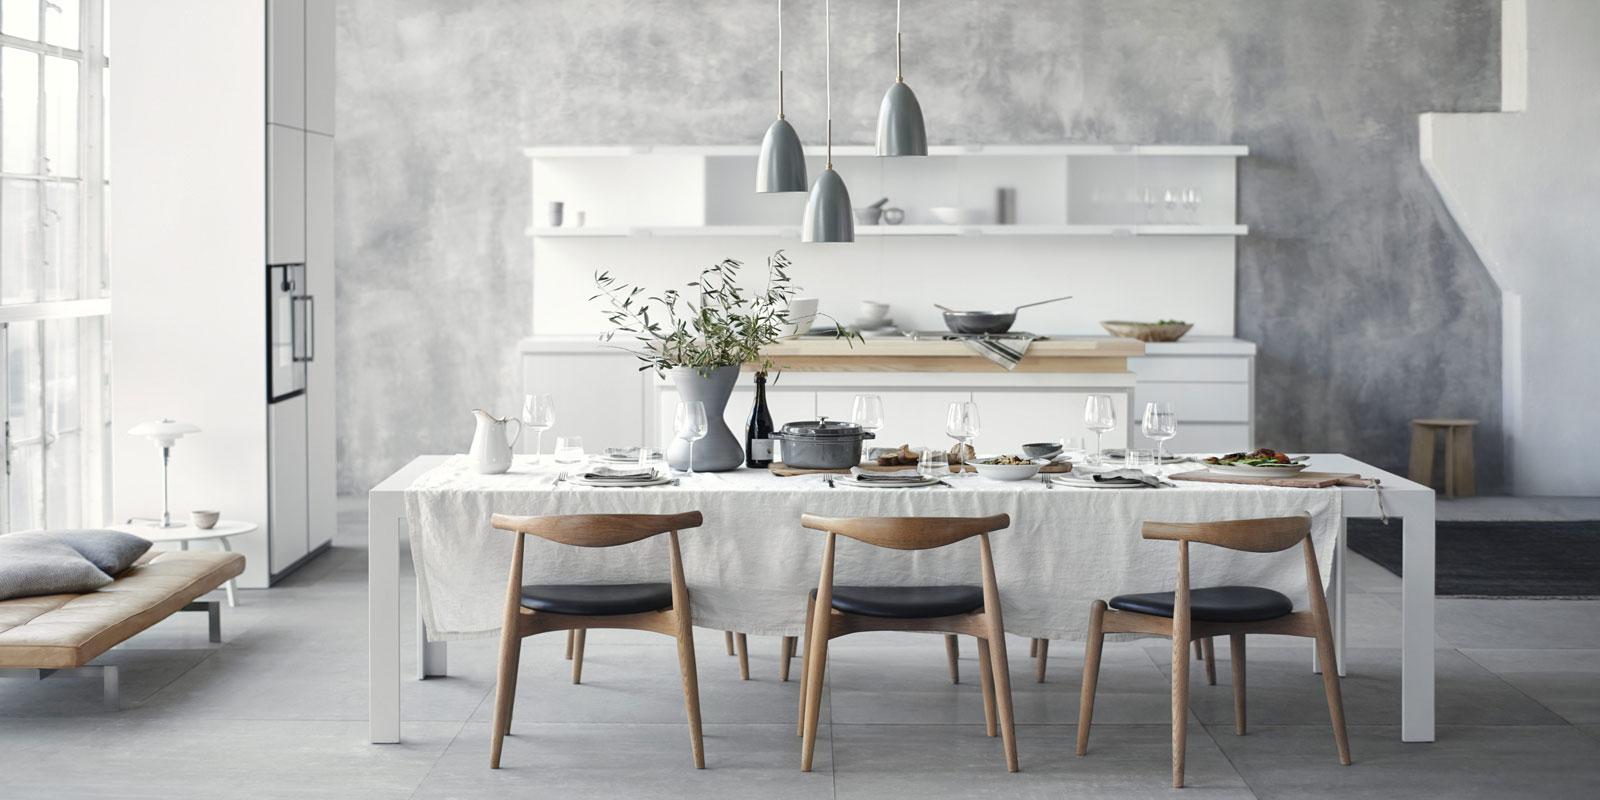 Bulthaup Keuken Werkbank : bulthaup-b1-wit-met-tafel-2016